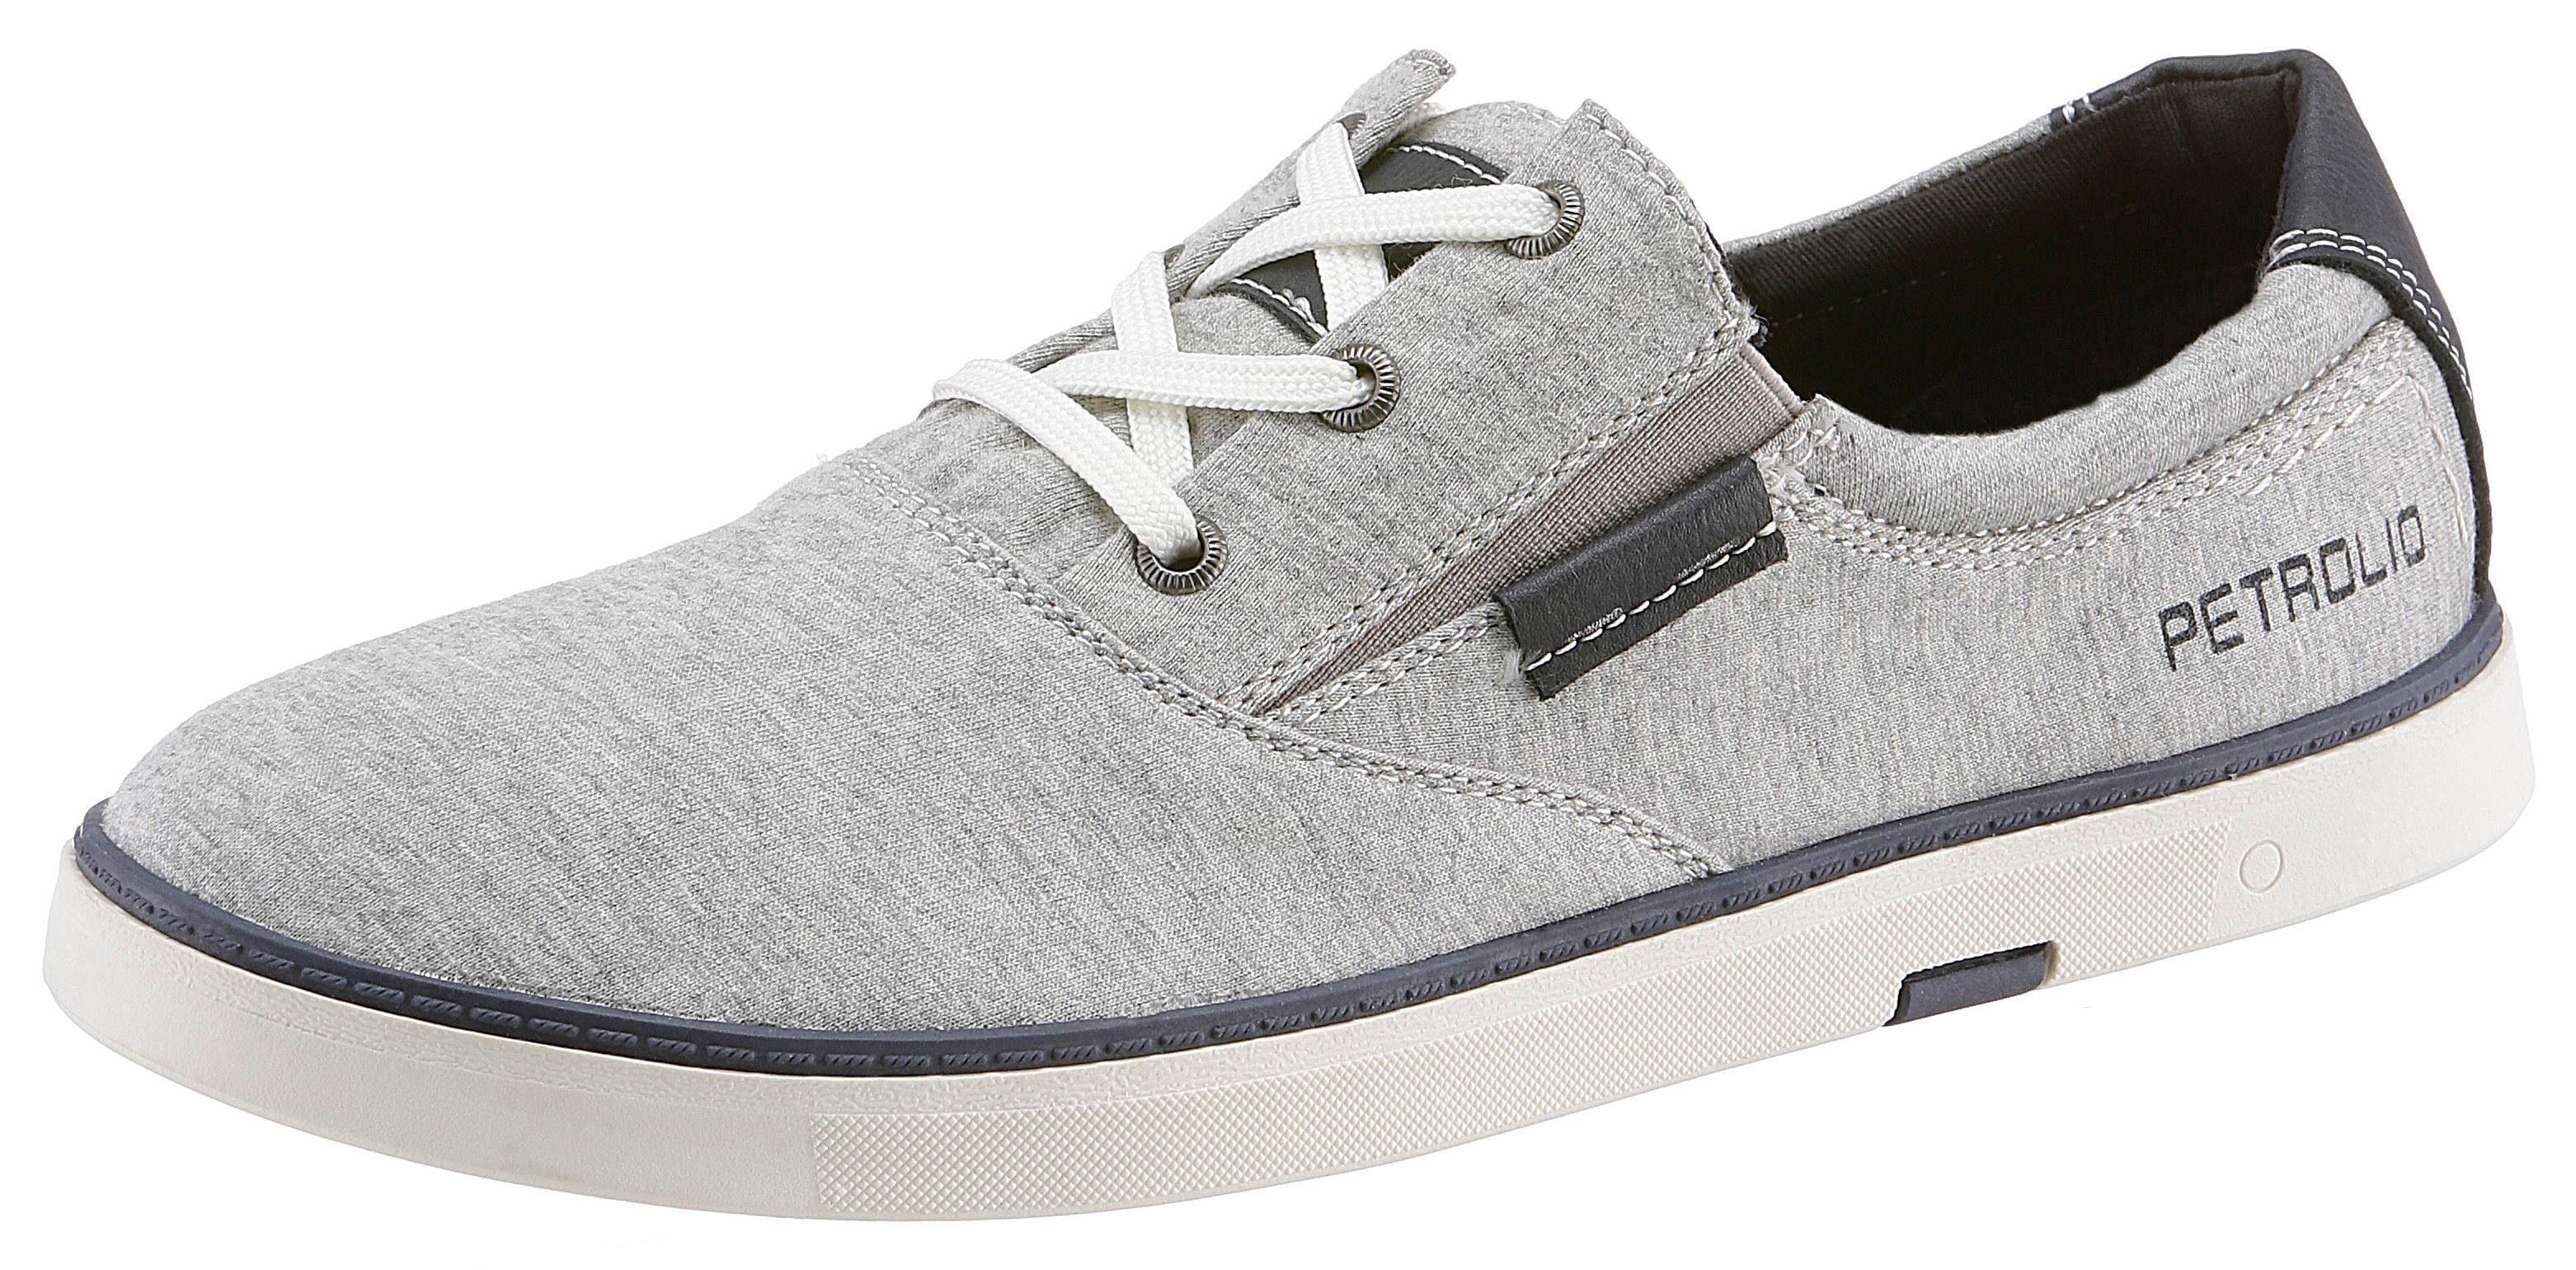 PETROLIO Sneaker, im Materialmix online kaufen  hellgrau